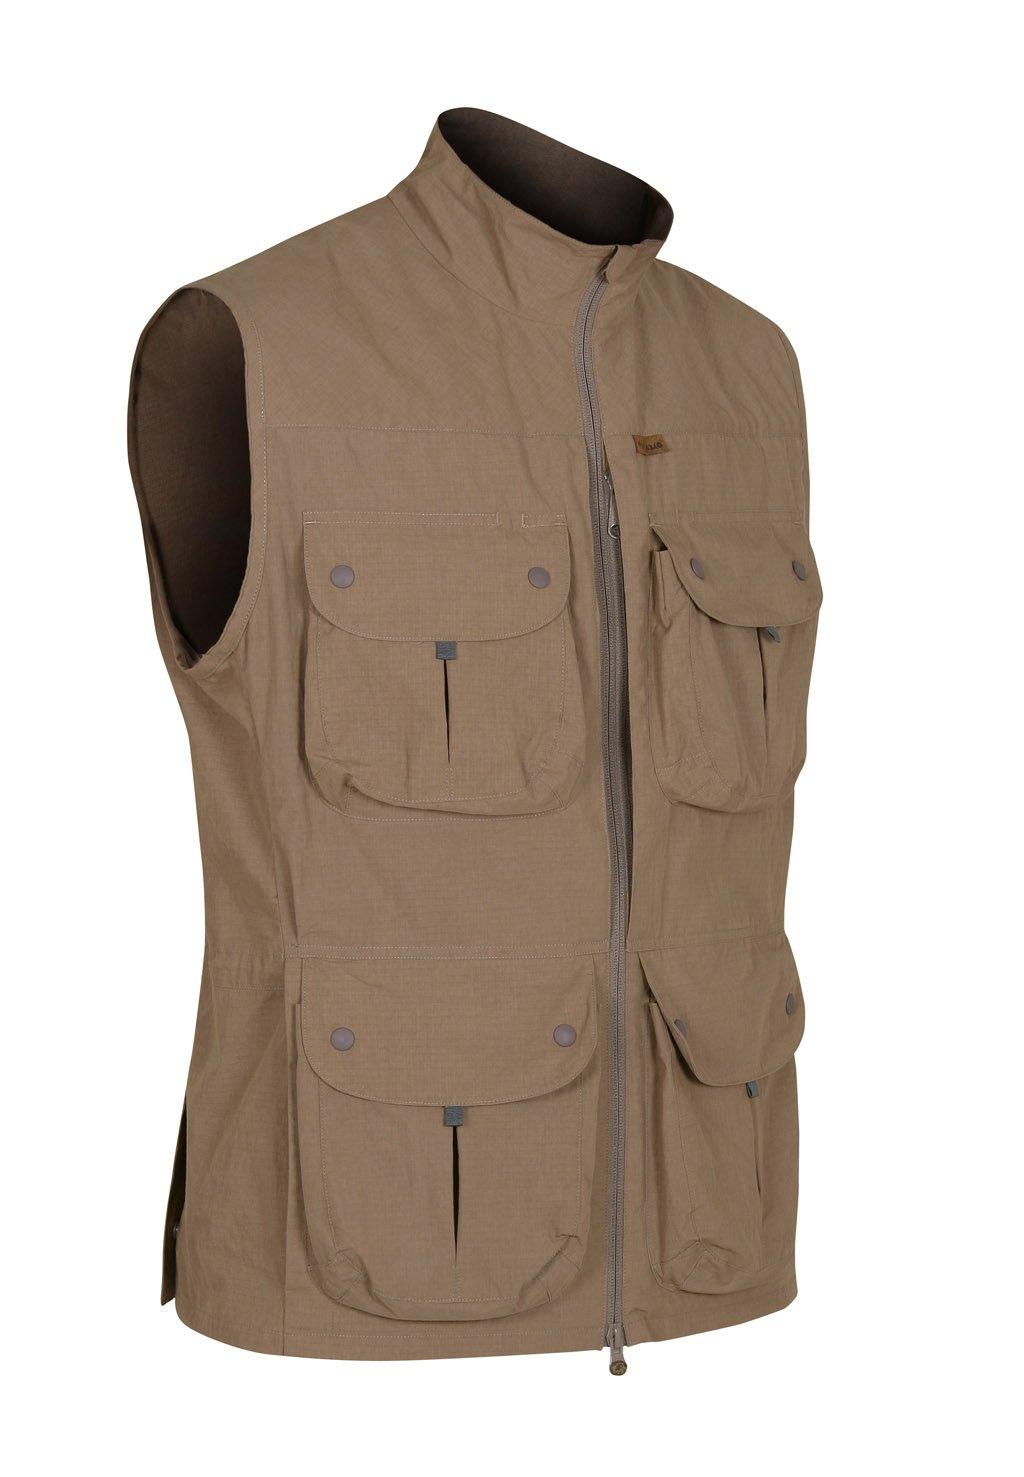 Paramo Herren Directional Clothing Systems Herren Paramo Halcon Weste Weste c7f71b